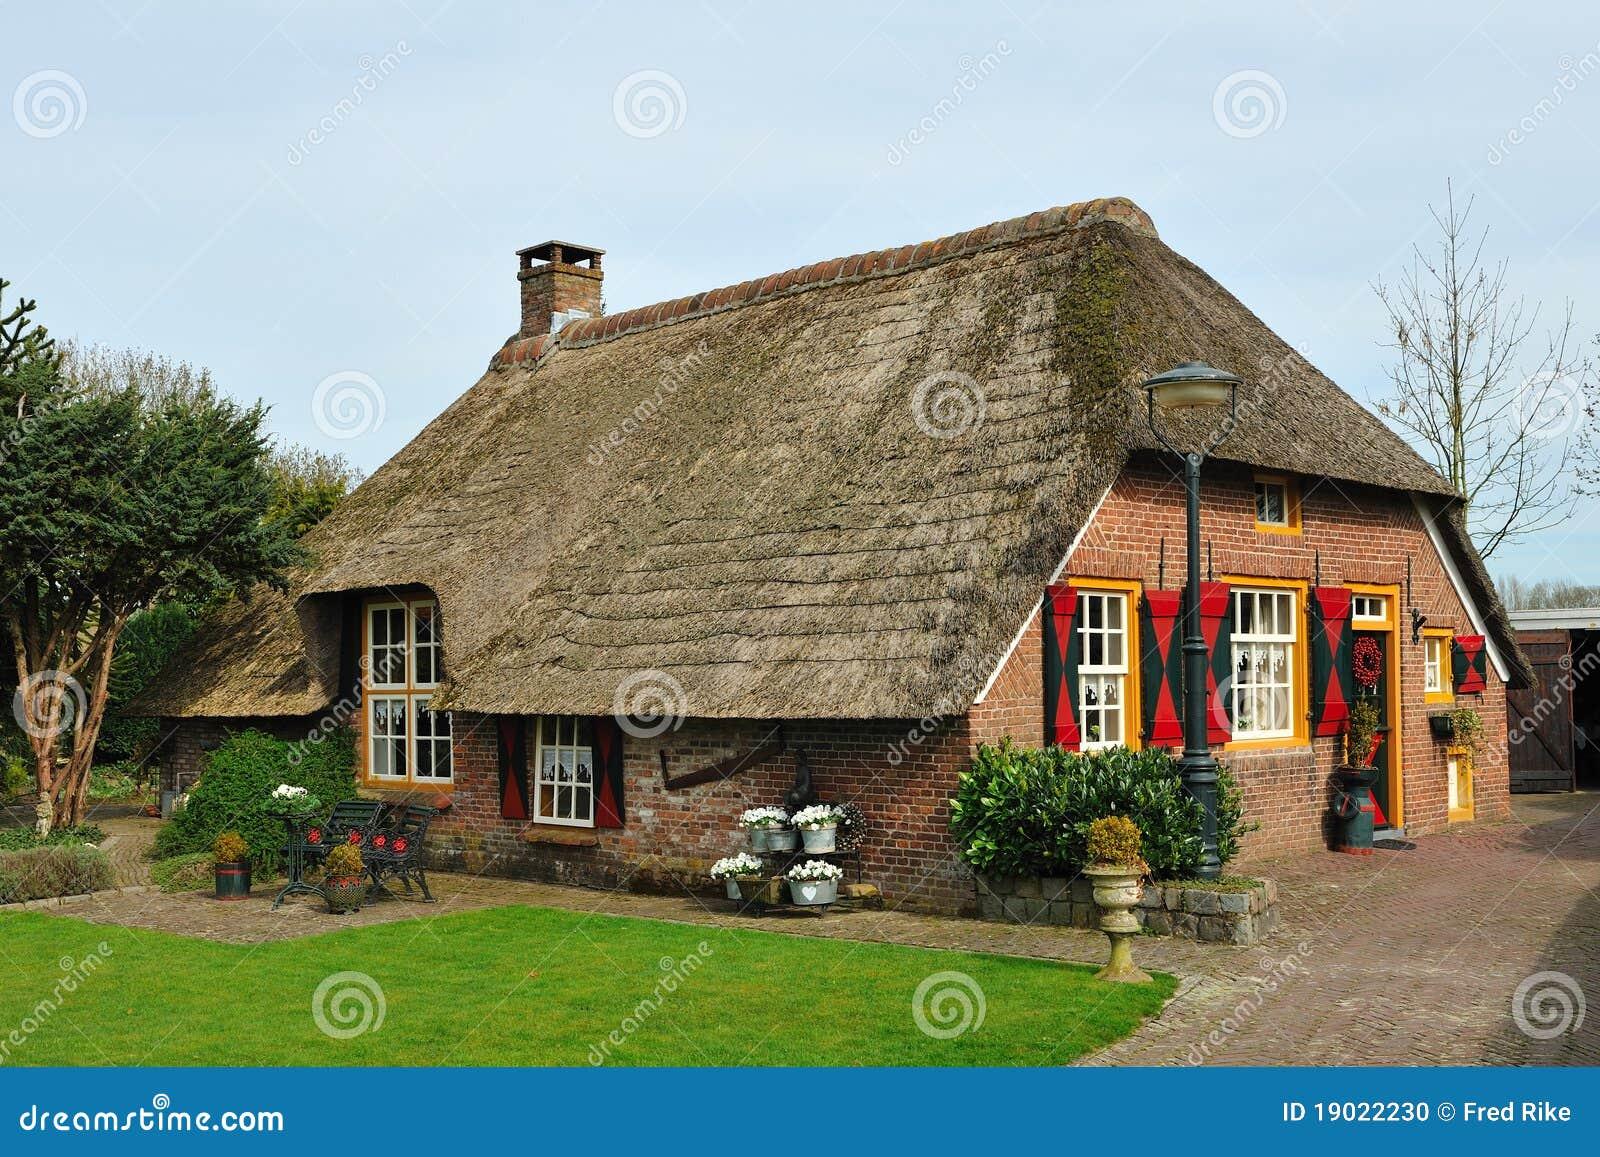 Dutch Farmhouse Stock Photo Image Of Scenic Brick